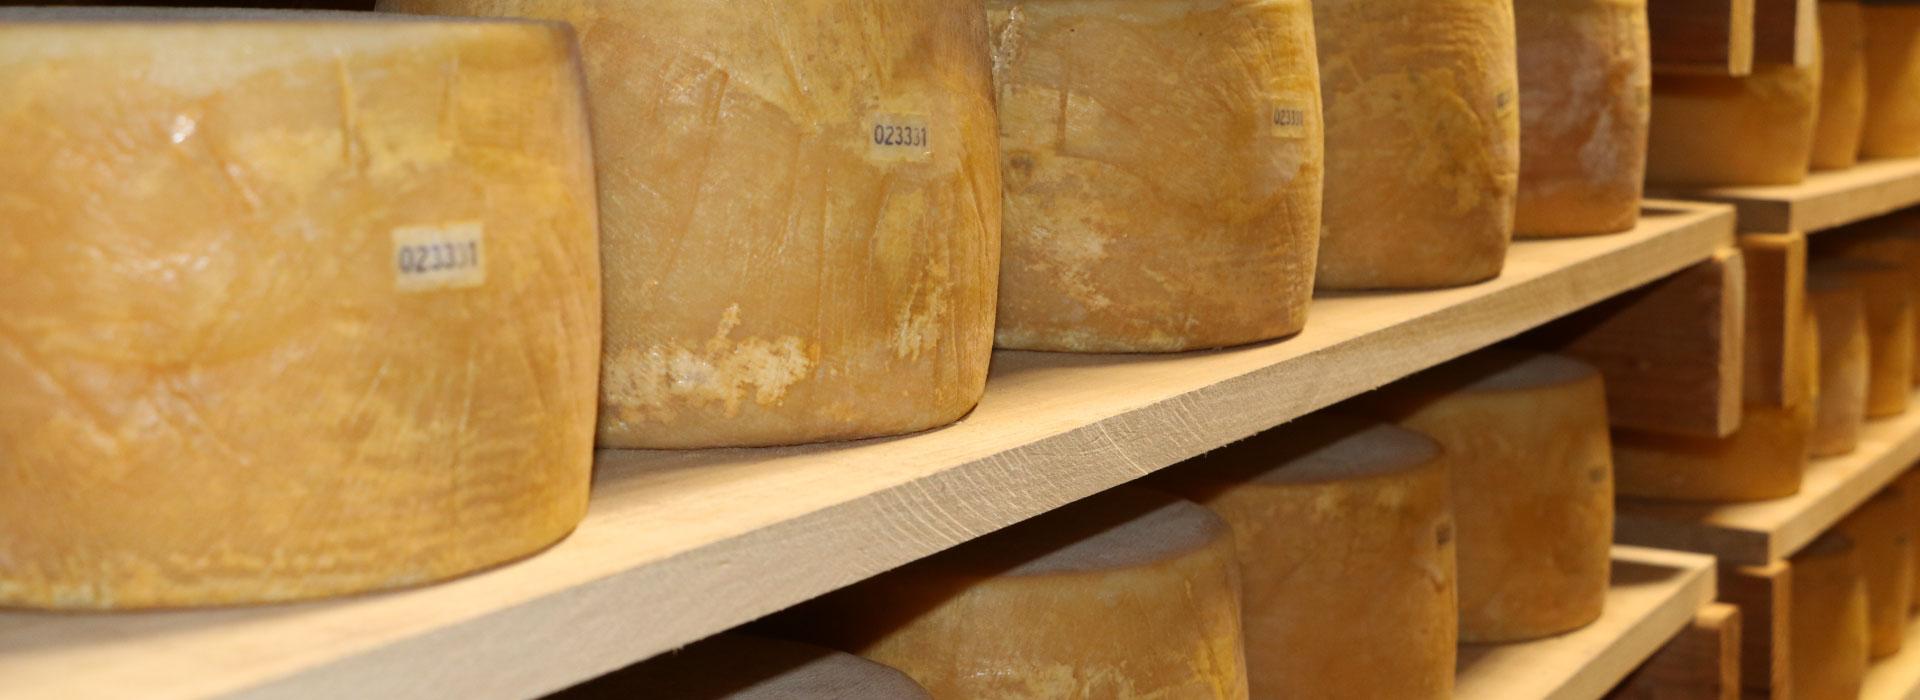 Nicolau Farms Cheese Aging Room